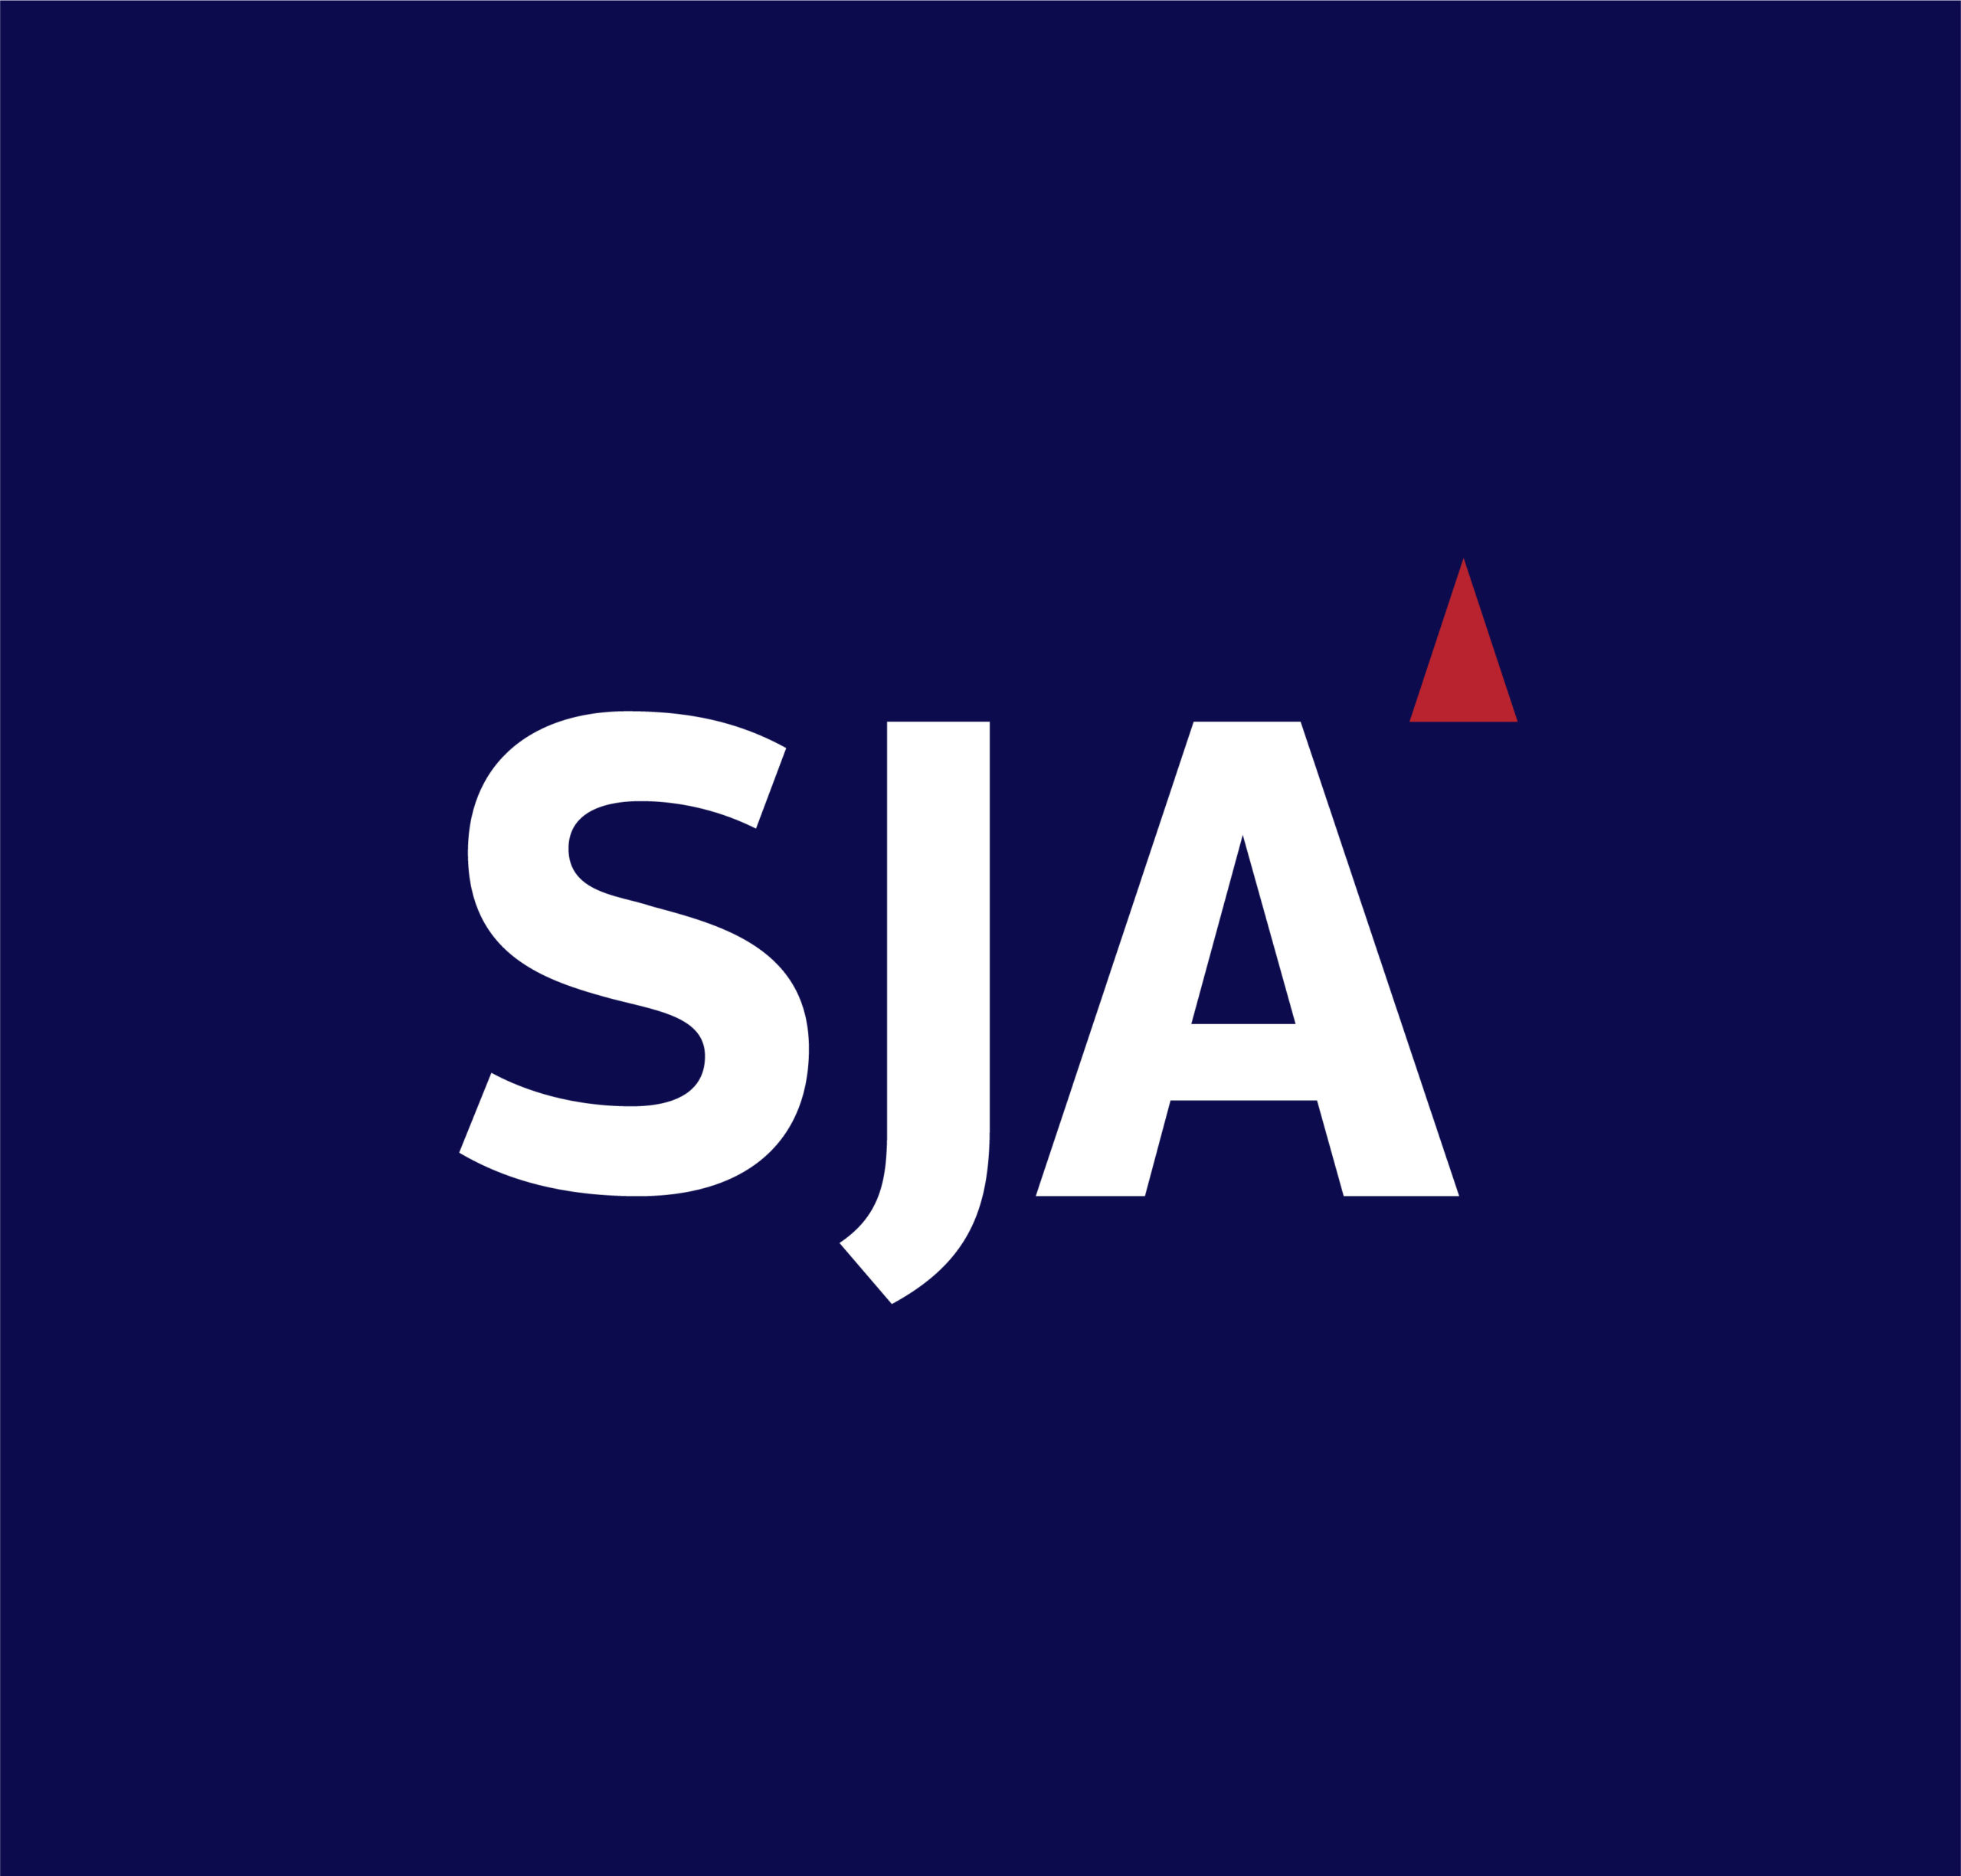 SJA logo